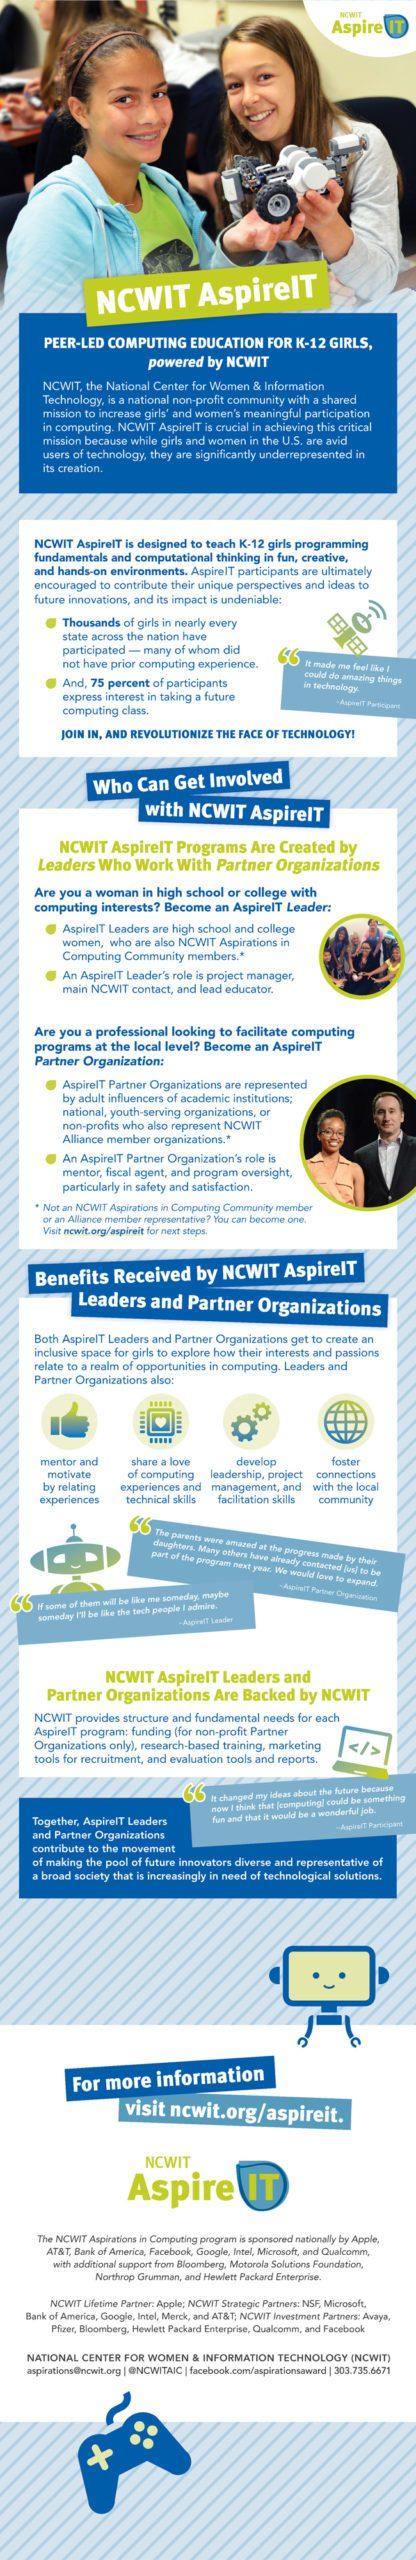 NCWIT AspireIT Infographic